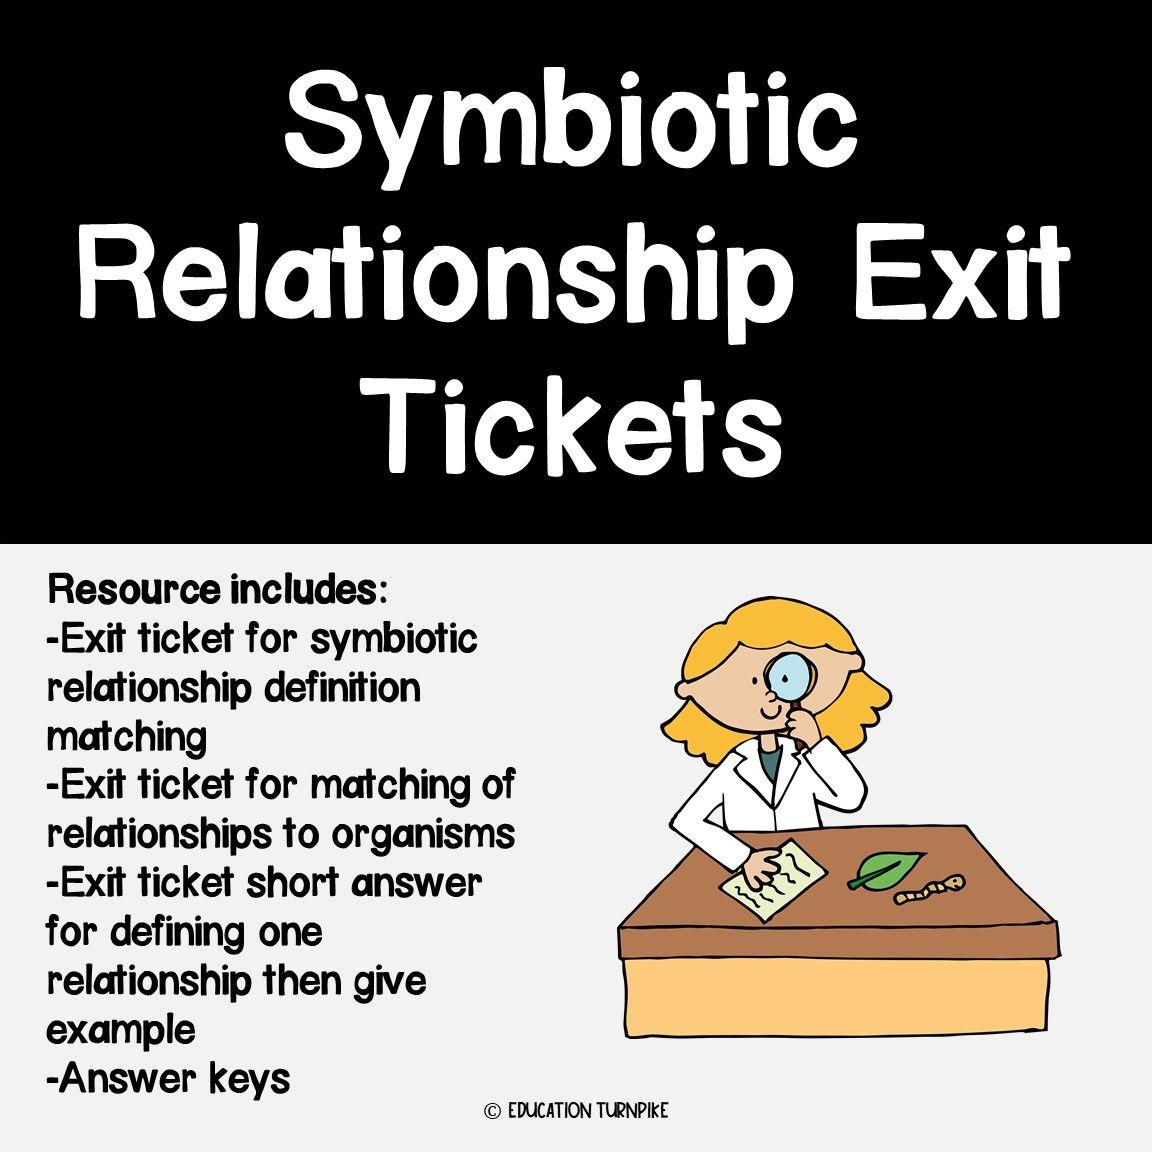 Symbiotic Relationship Exit Tickets